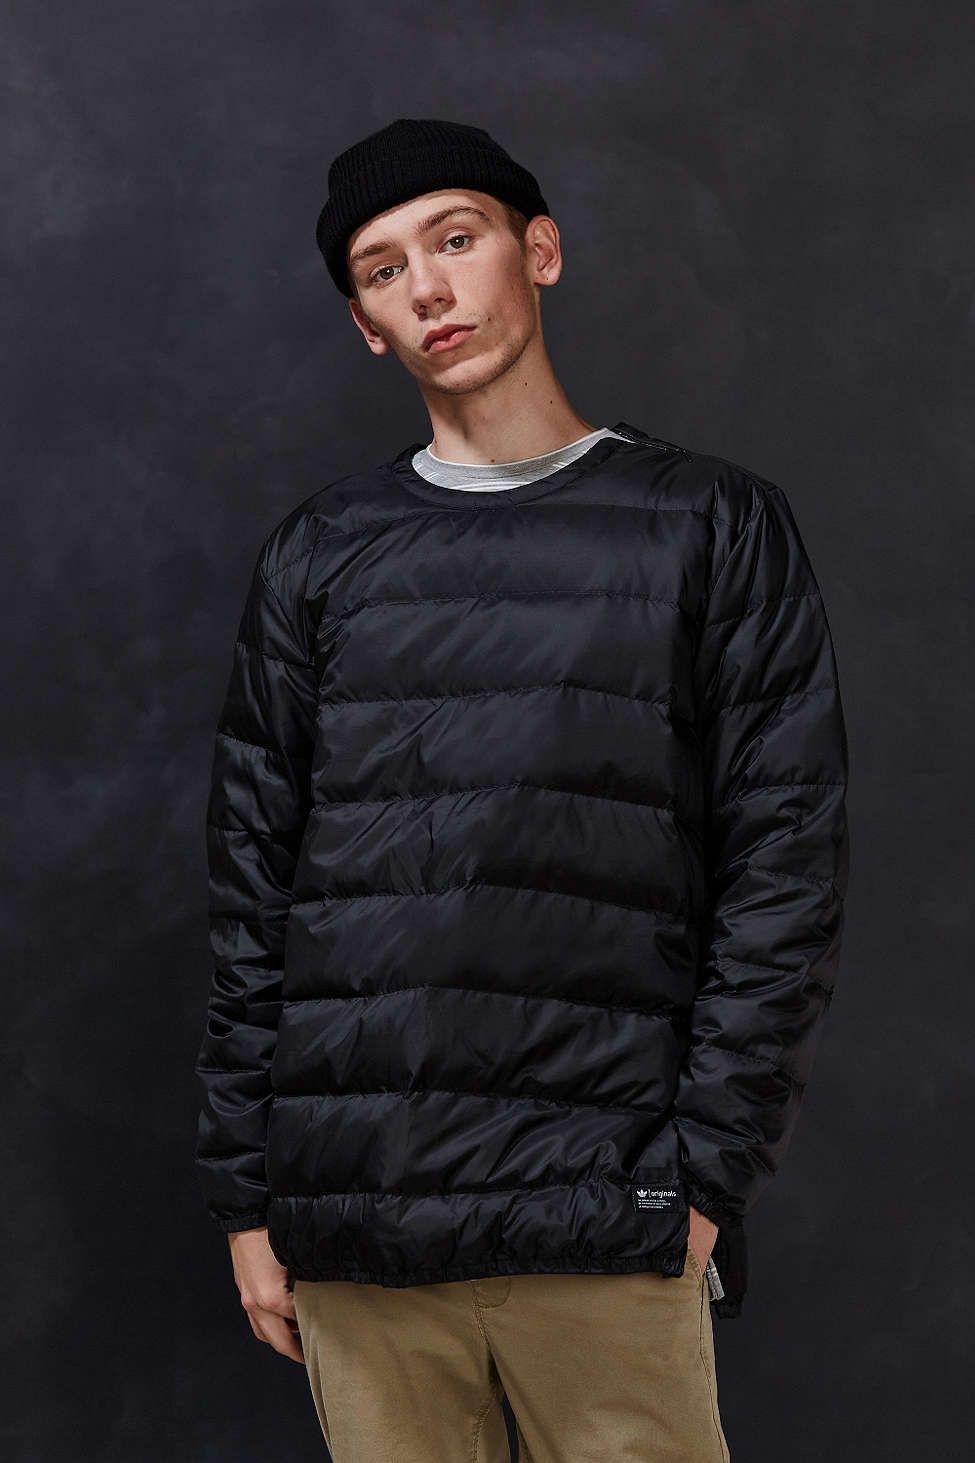 Urban Adidas Neck Jacket Originals Outfitters Climbing Crew xFrI4wqF